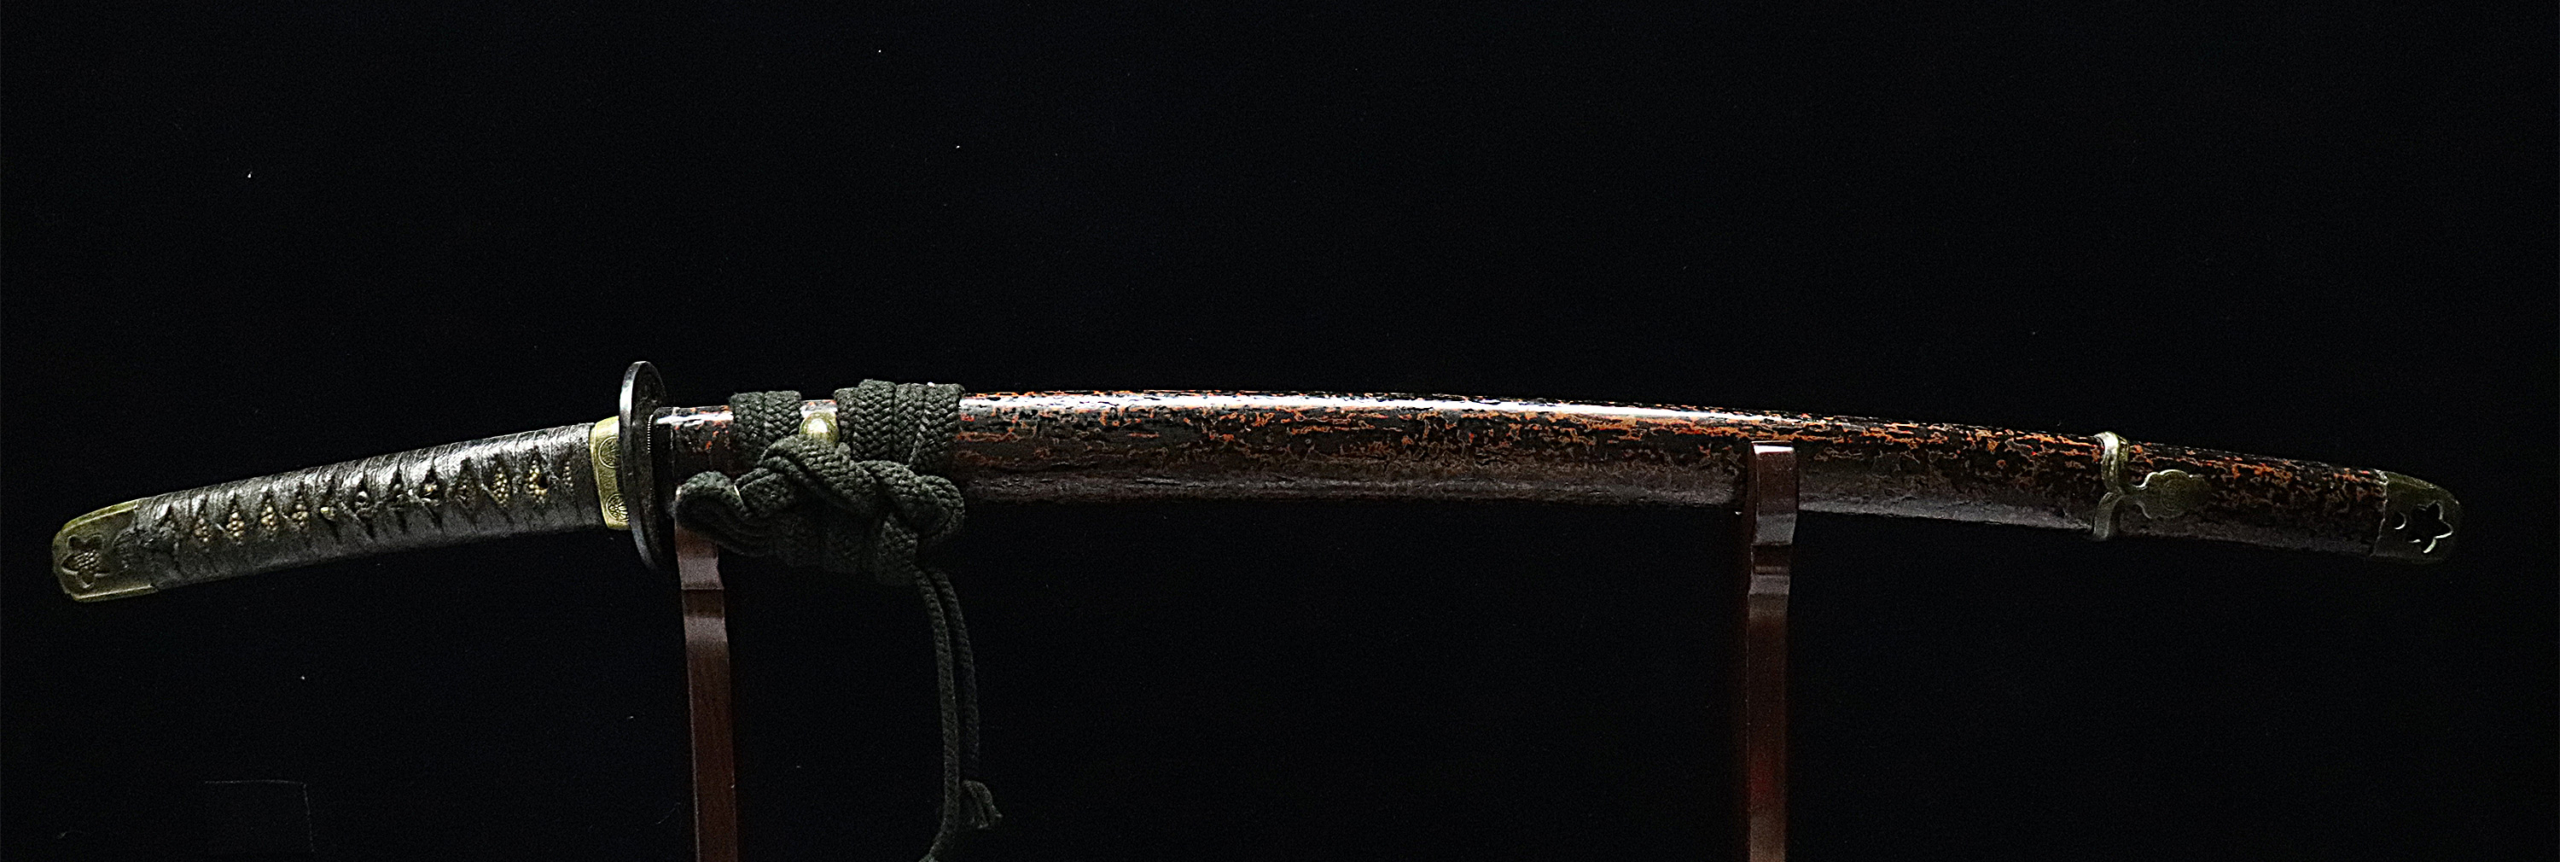 09-056